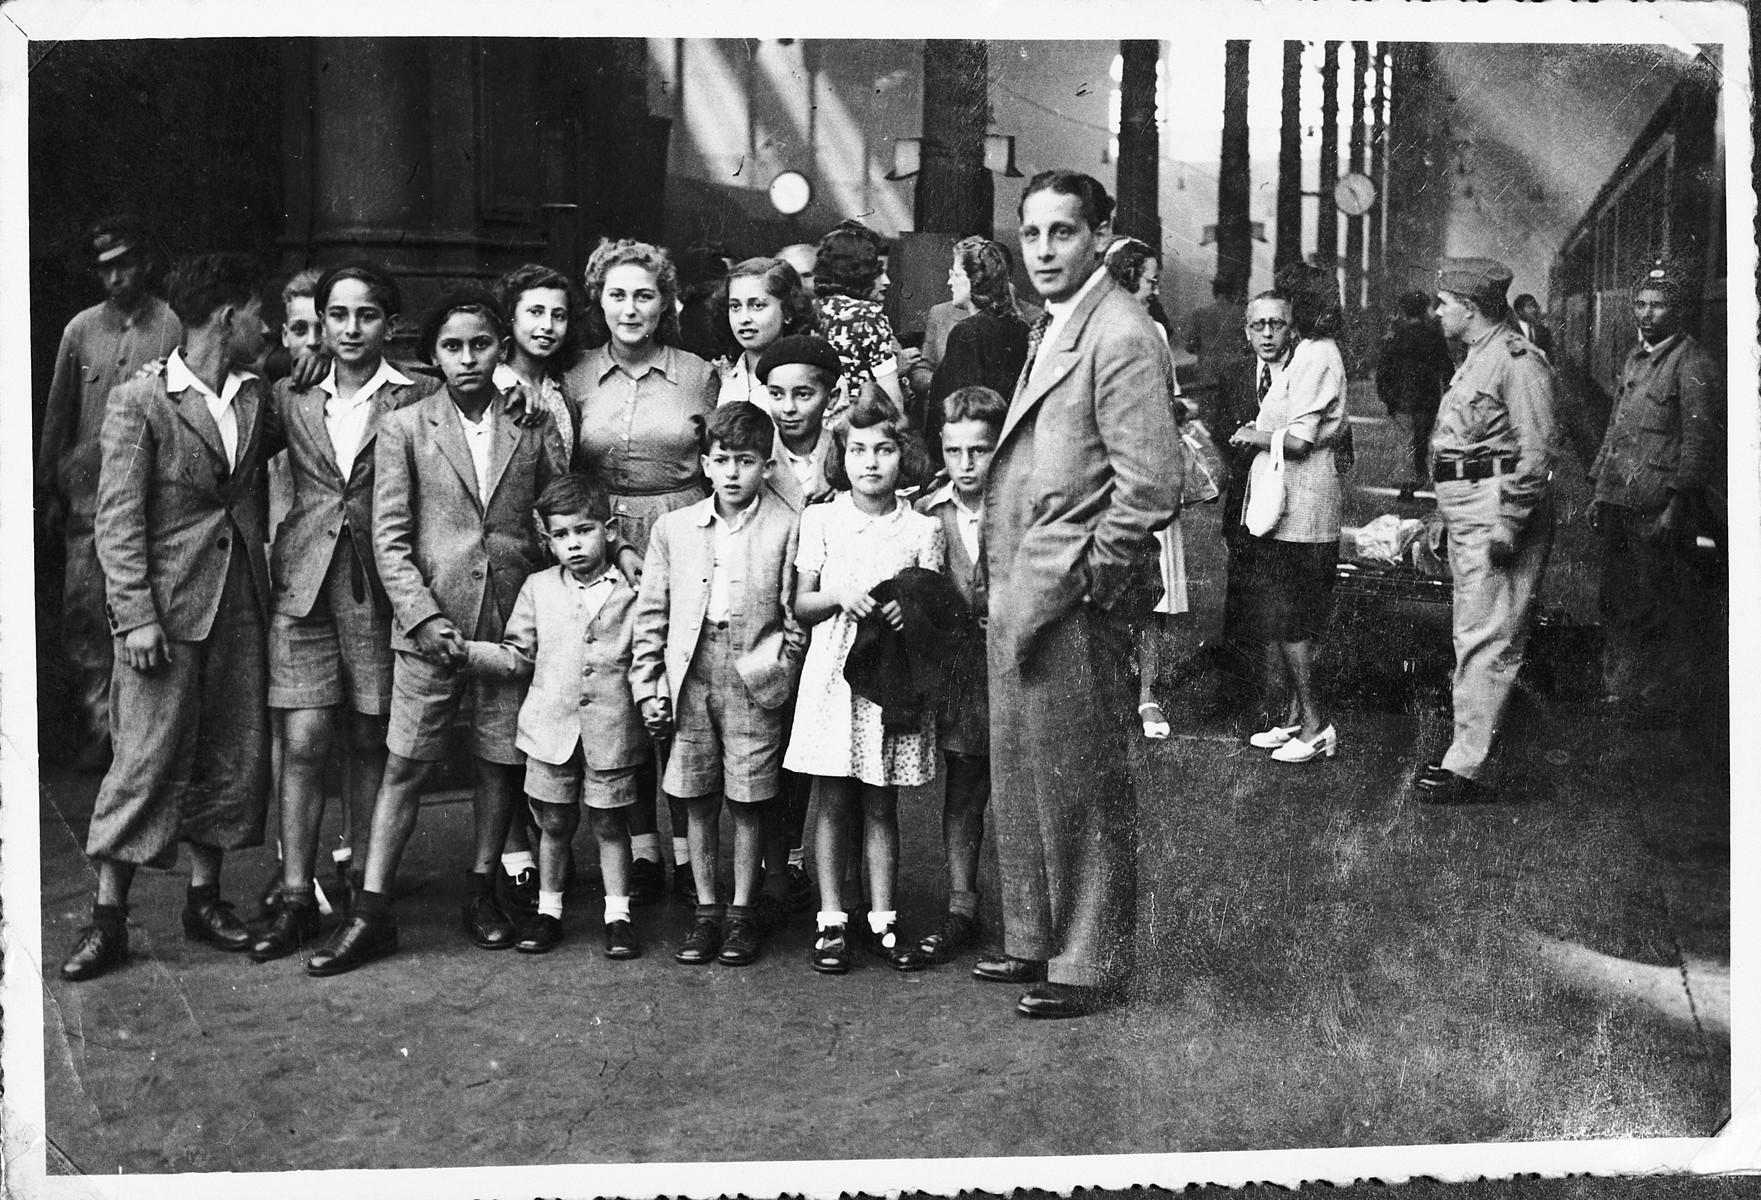 Jewish refugee children gather in a train station in Lisbon prior to their departure for Palestine.